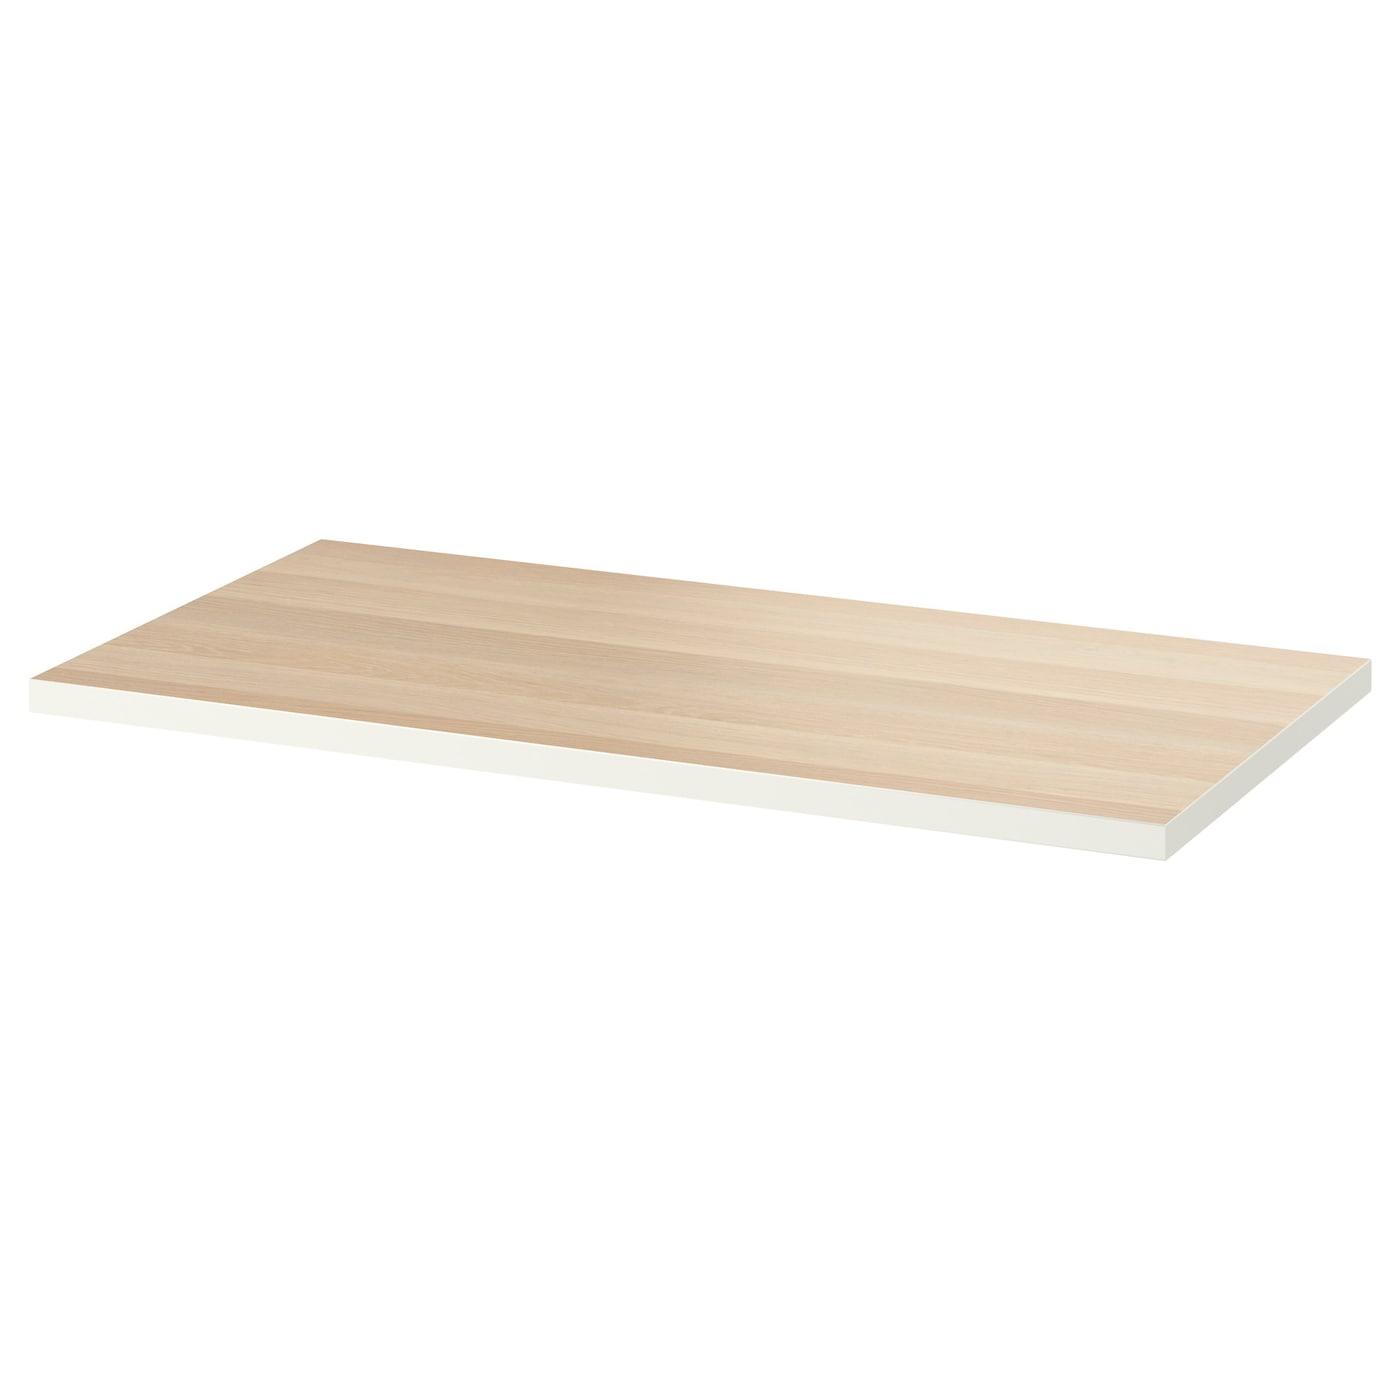 linnmon table top klimaanlage und heizung. Black Bedroom Furniture Sets. Home Design Ideas